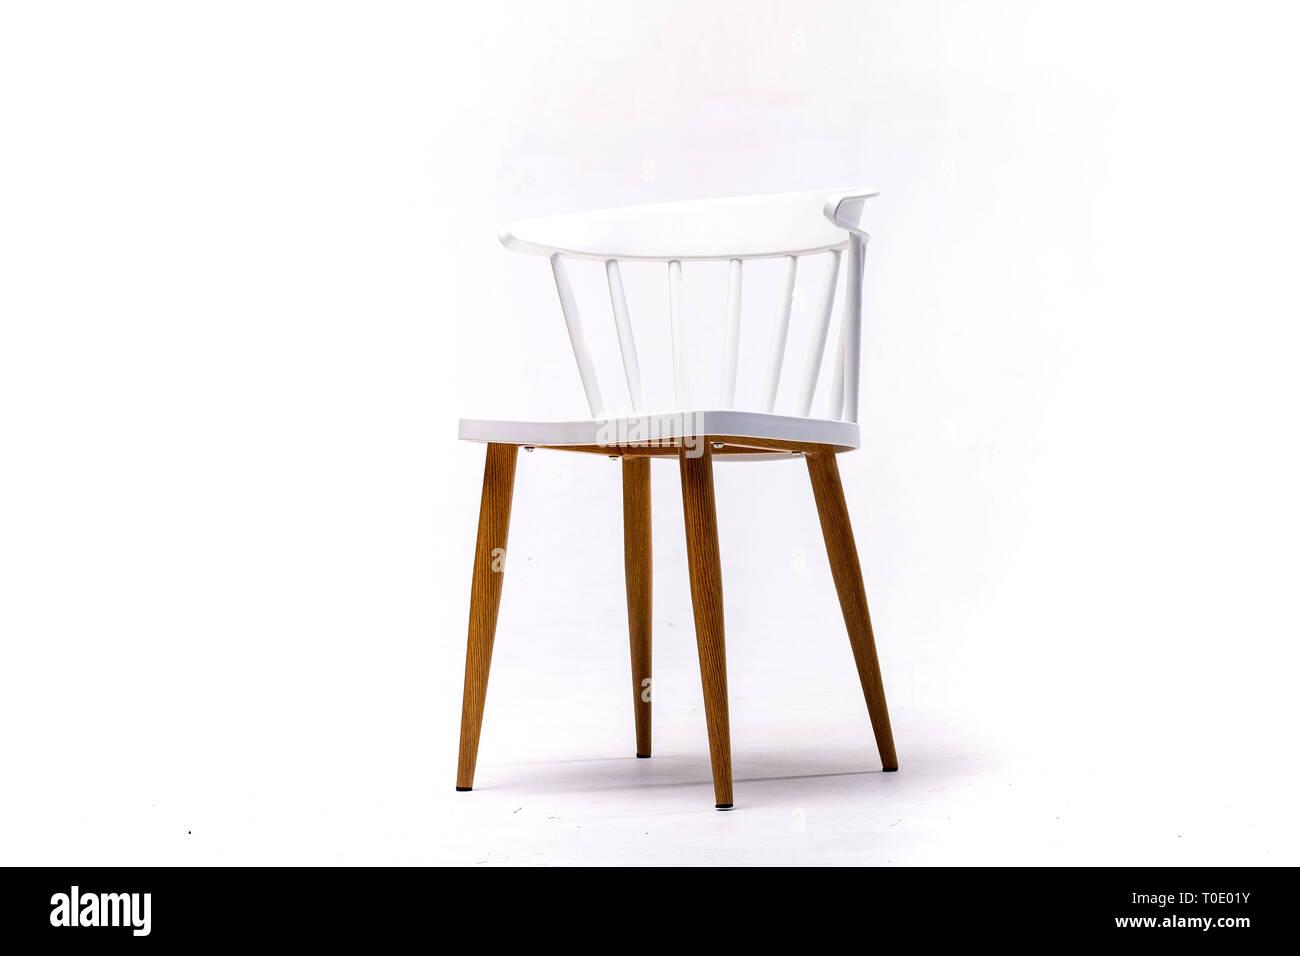 Design Stuhl Kunststoff Stuhl Esstisch Design